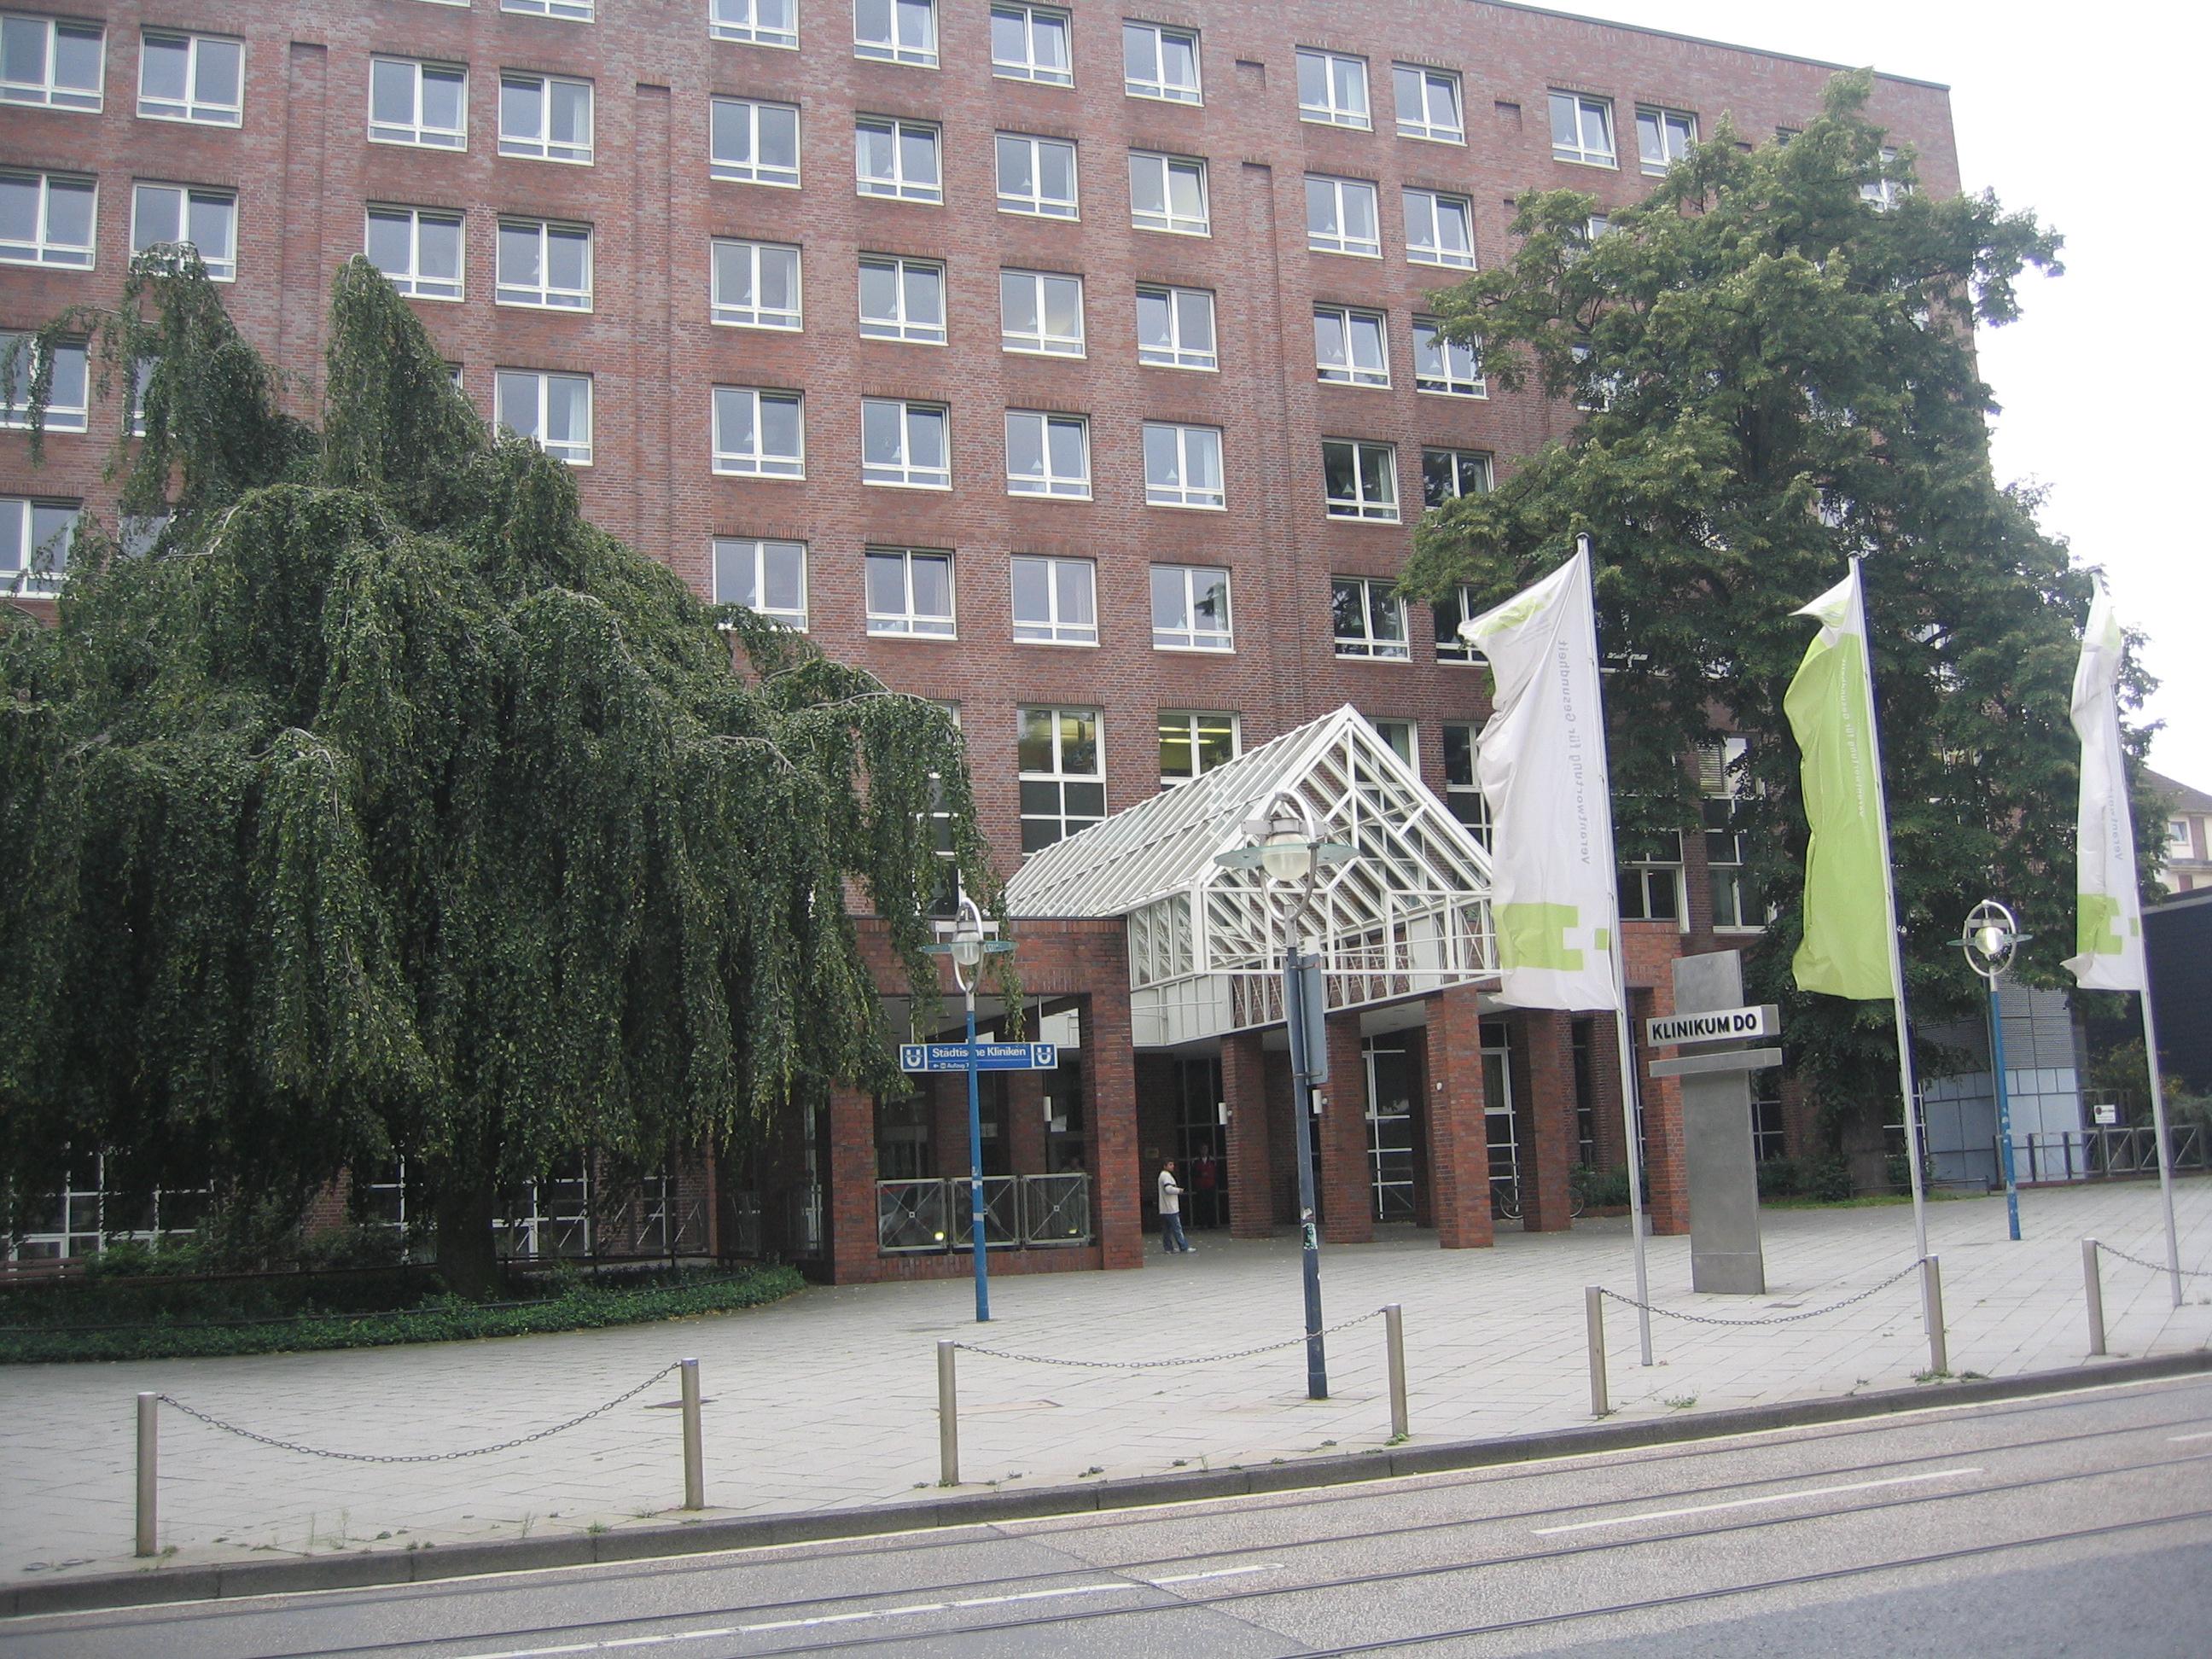 Krankenhaus Dortmund